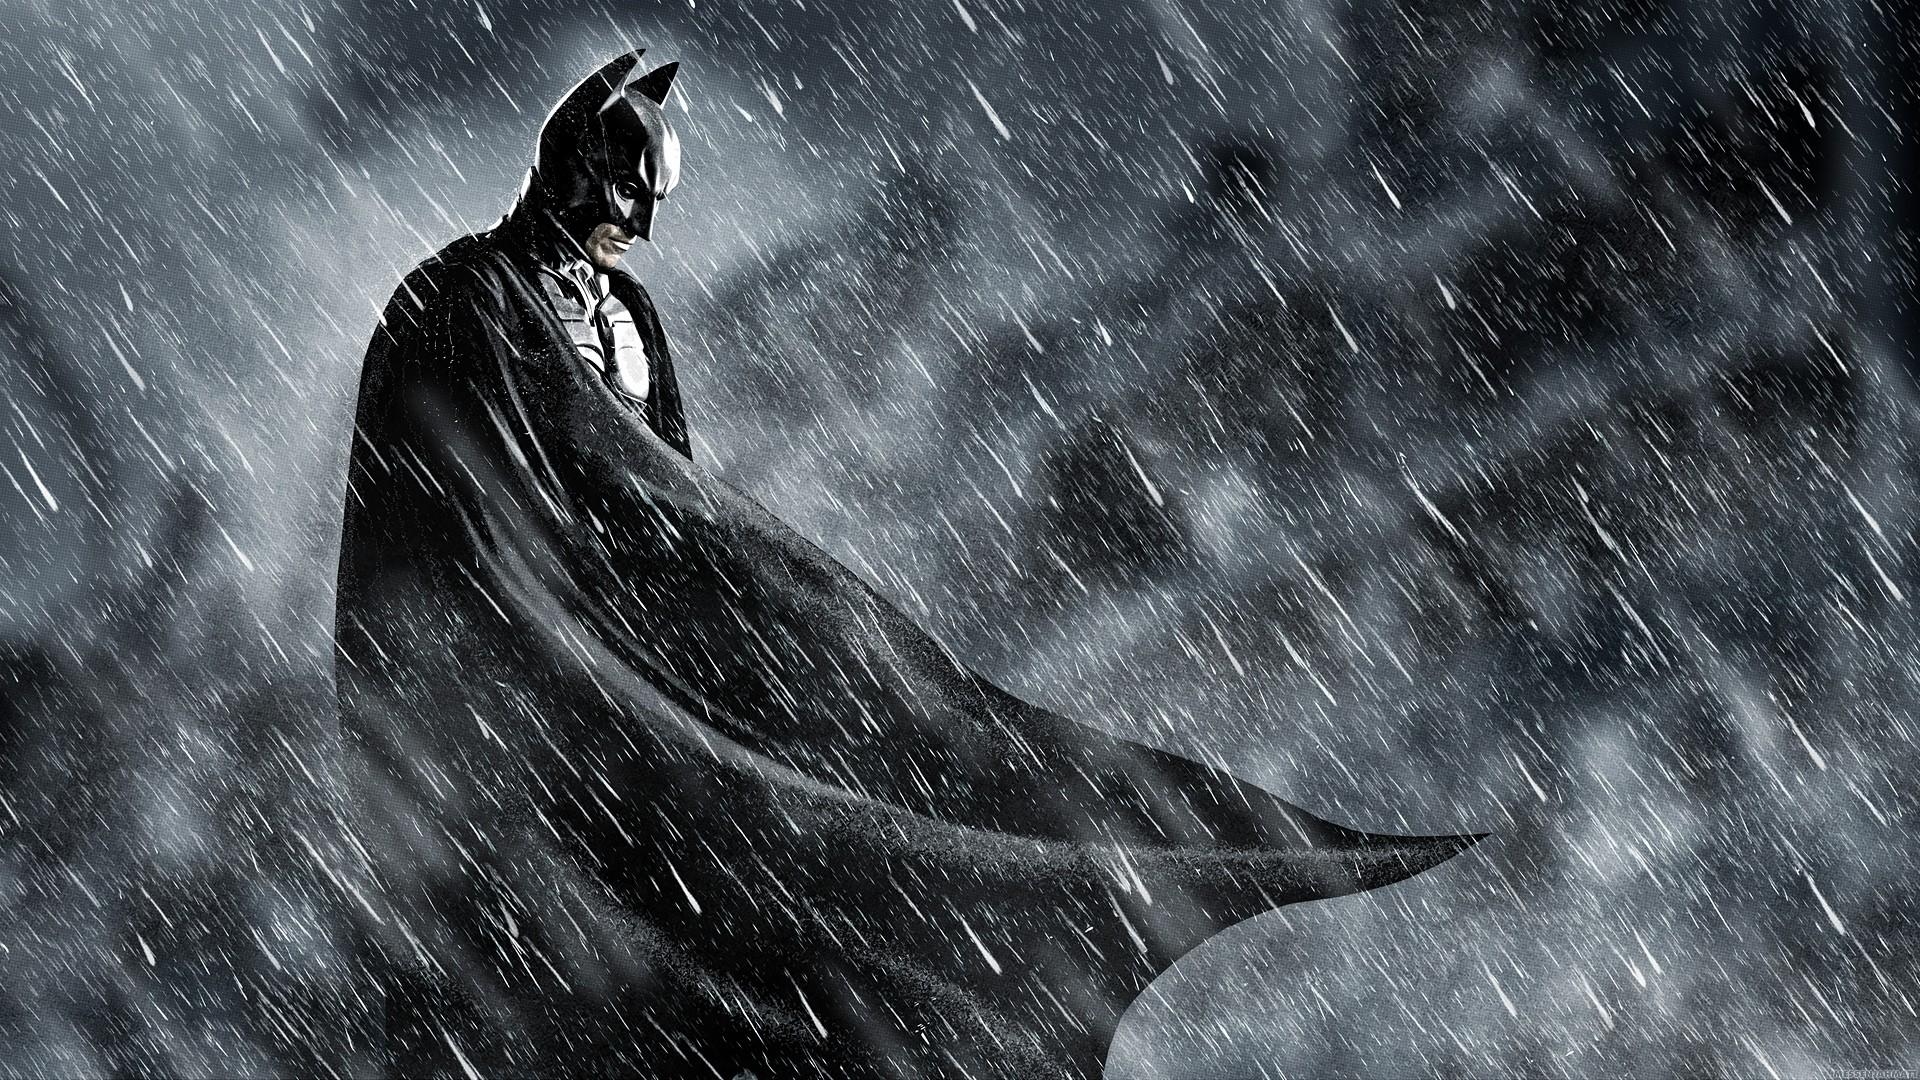 Dark Knight good wallpaper hd